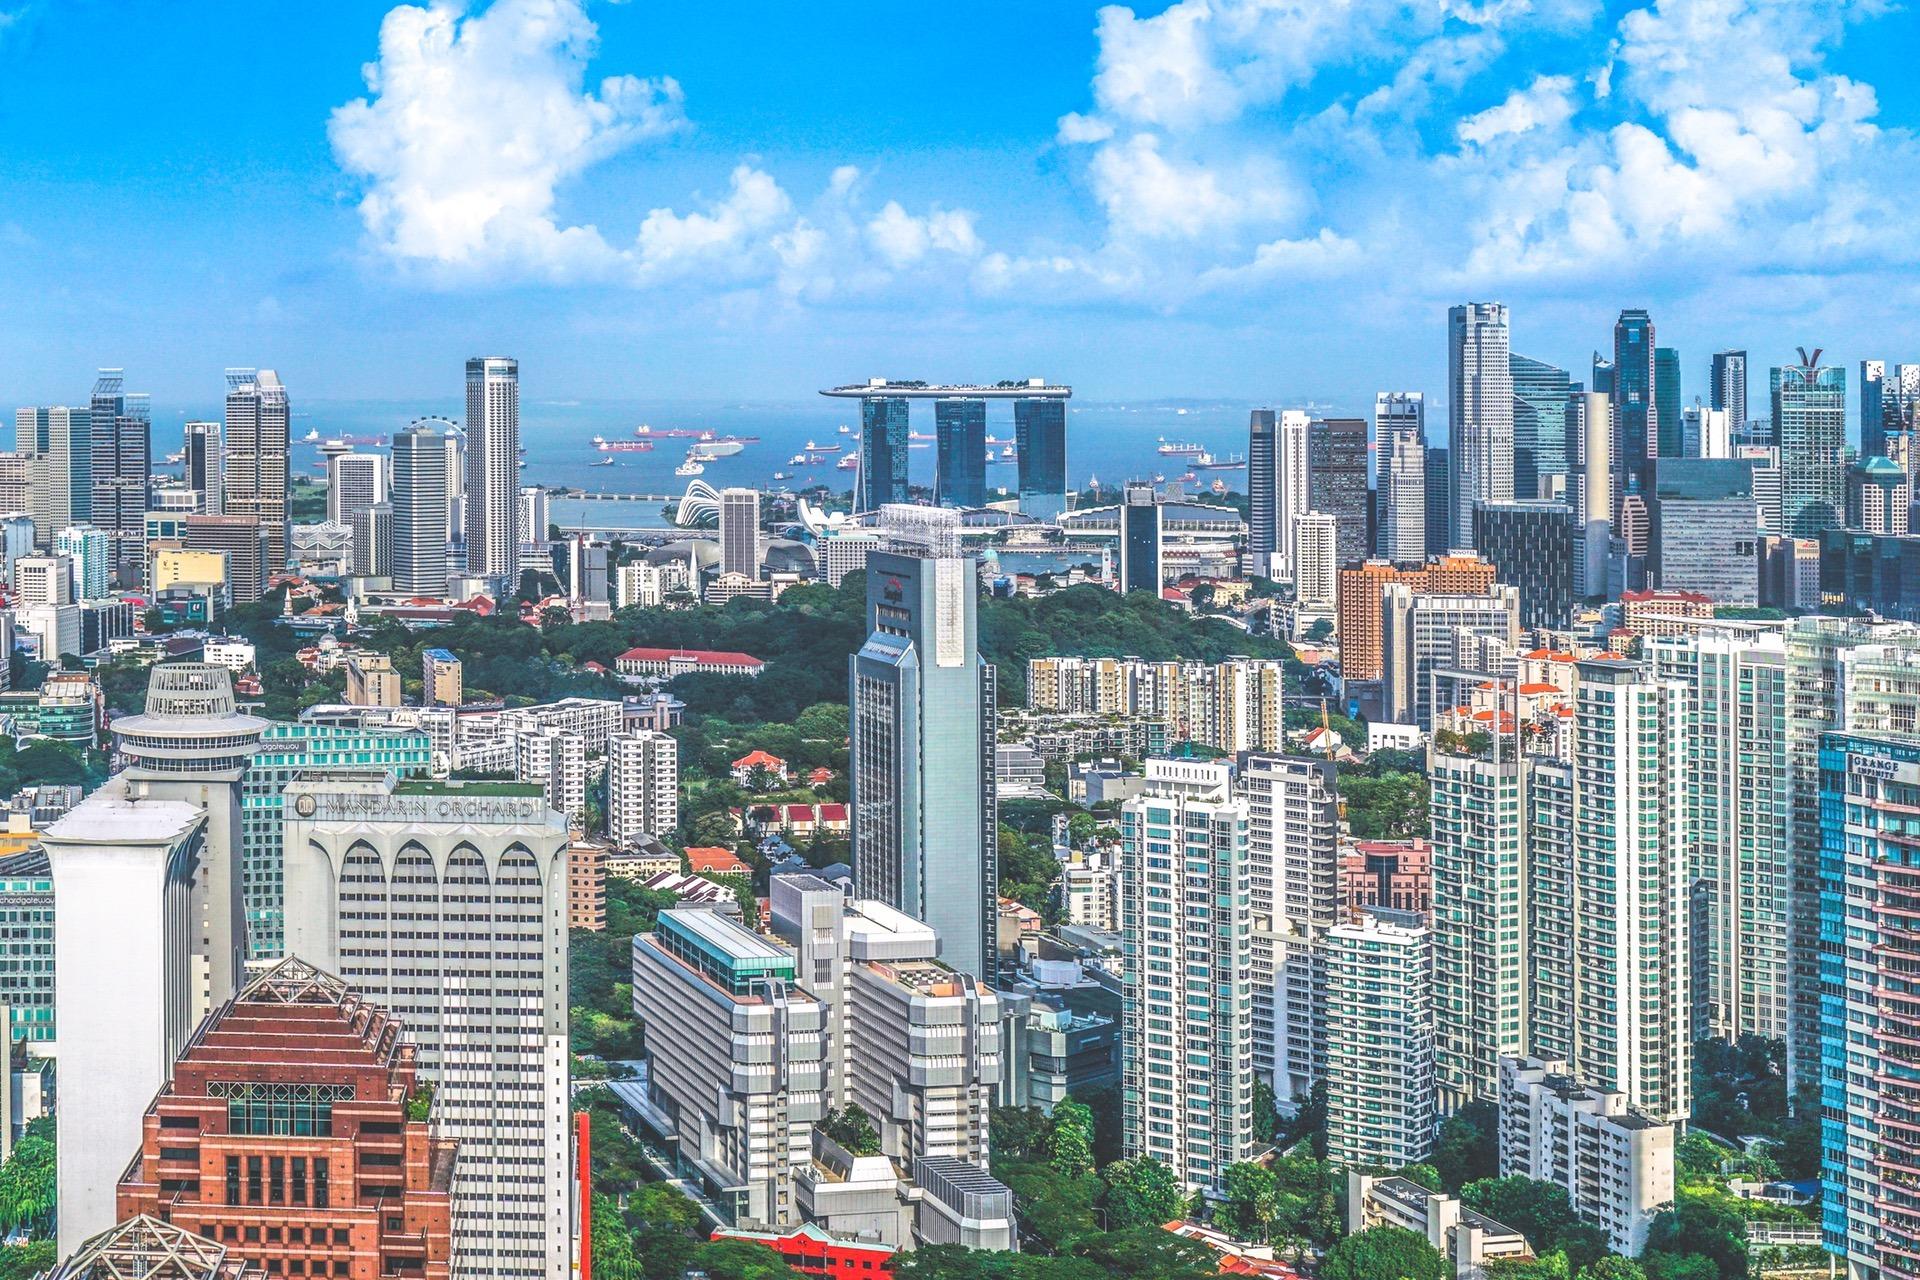 Business Opportunities for Budding Entrepreneurs in Singapore